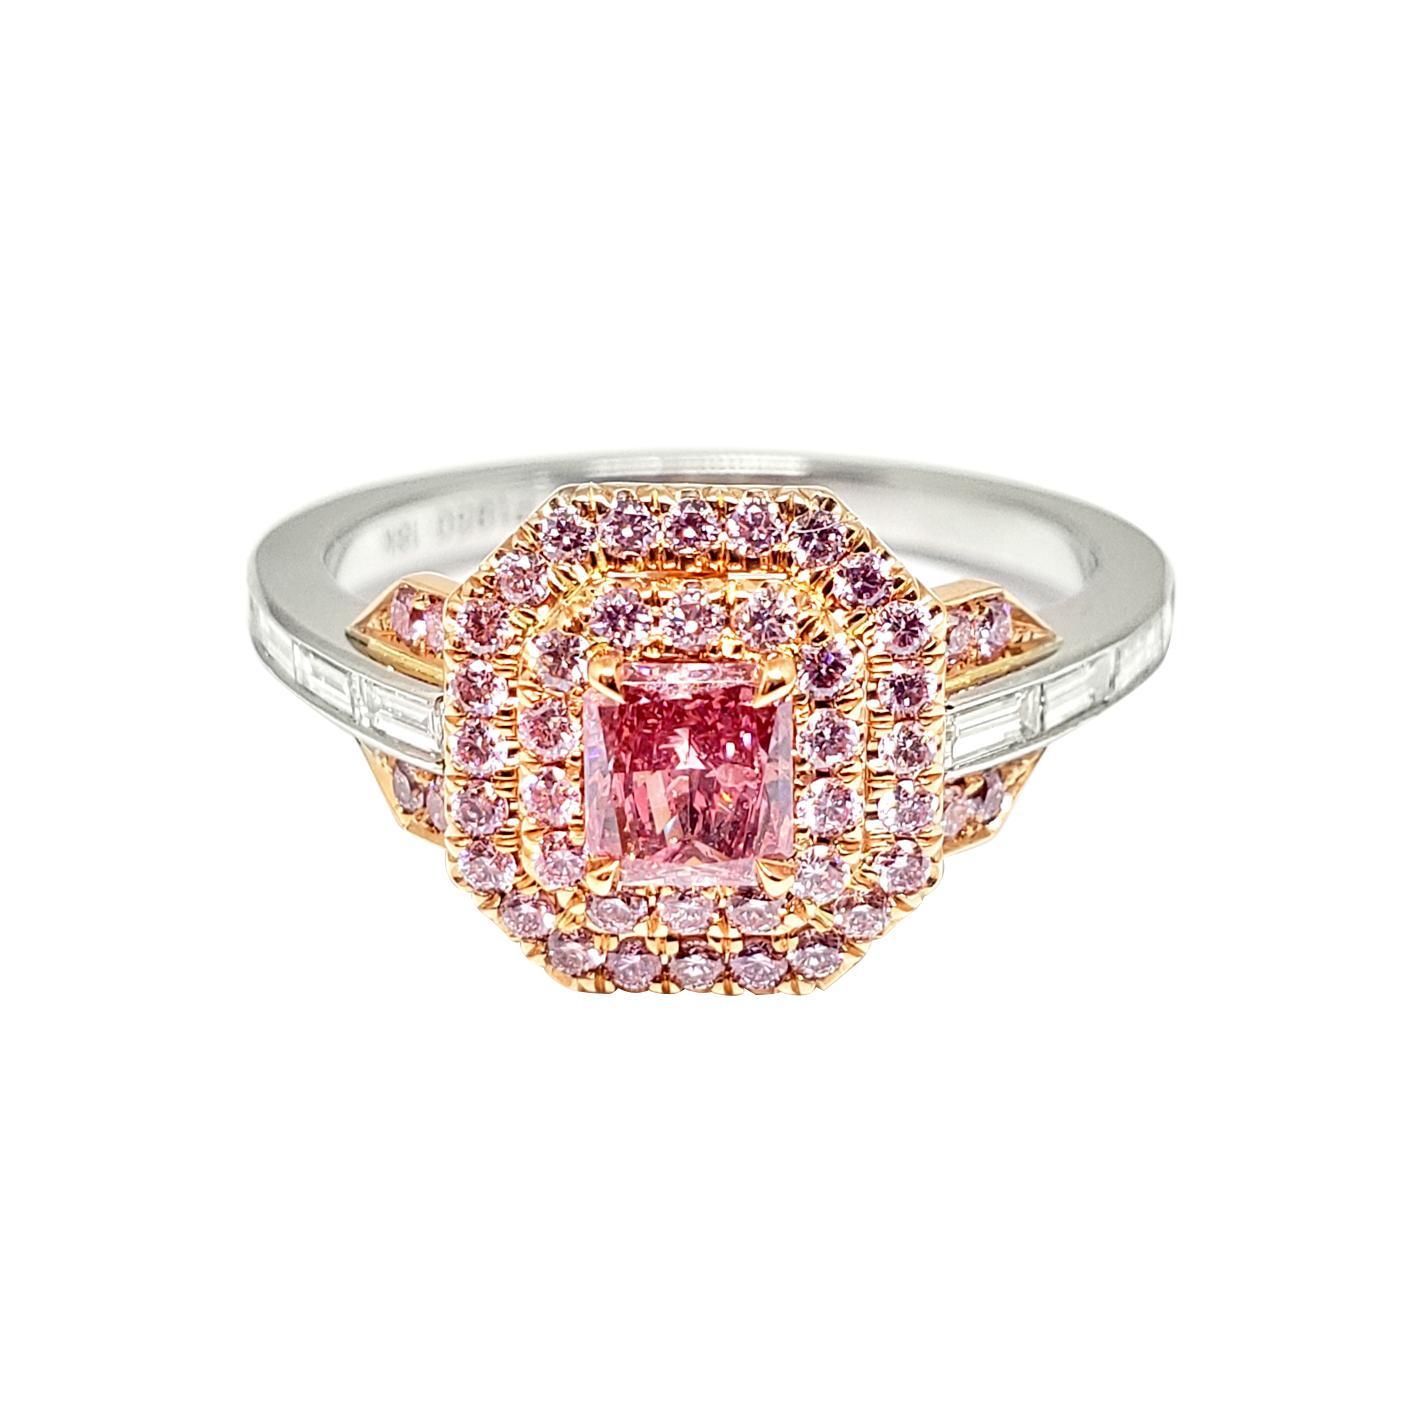 pink-diamond-and-platinum-art-deco-ring-2959